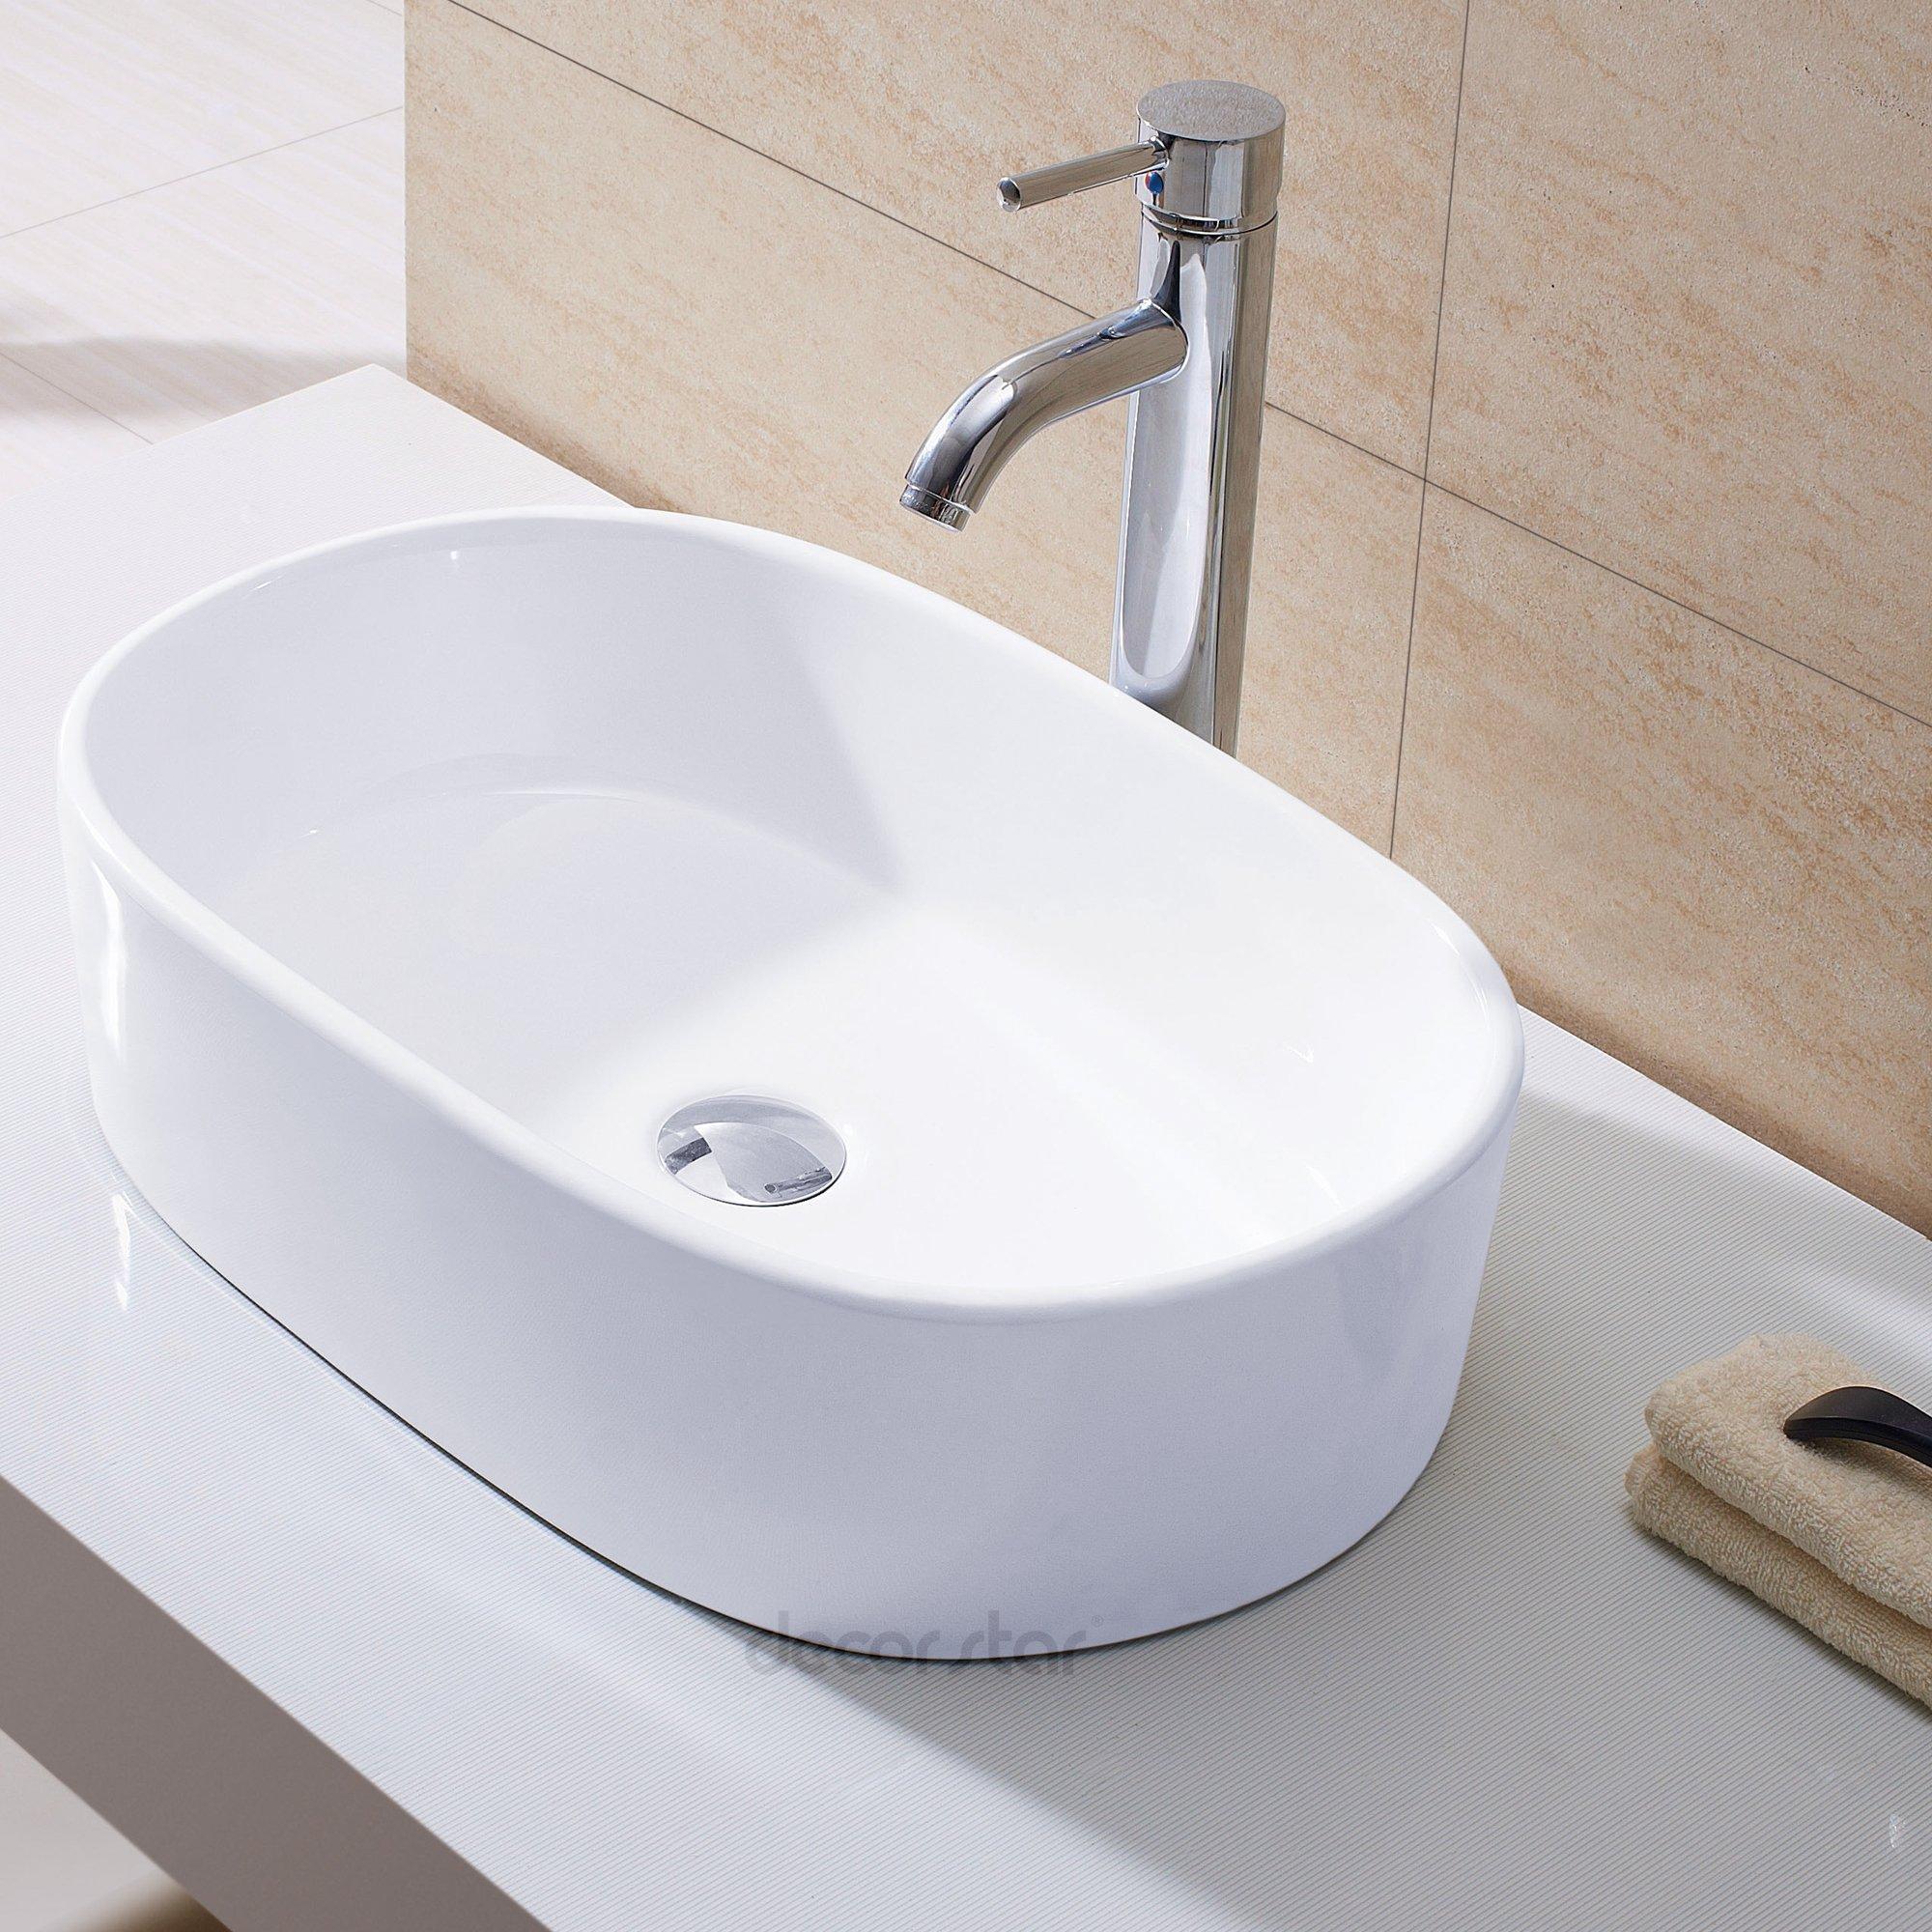 Decor Star CB-002 Bathroom Porcelain Ceramic Vessel Vanity Sink Art Basin